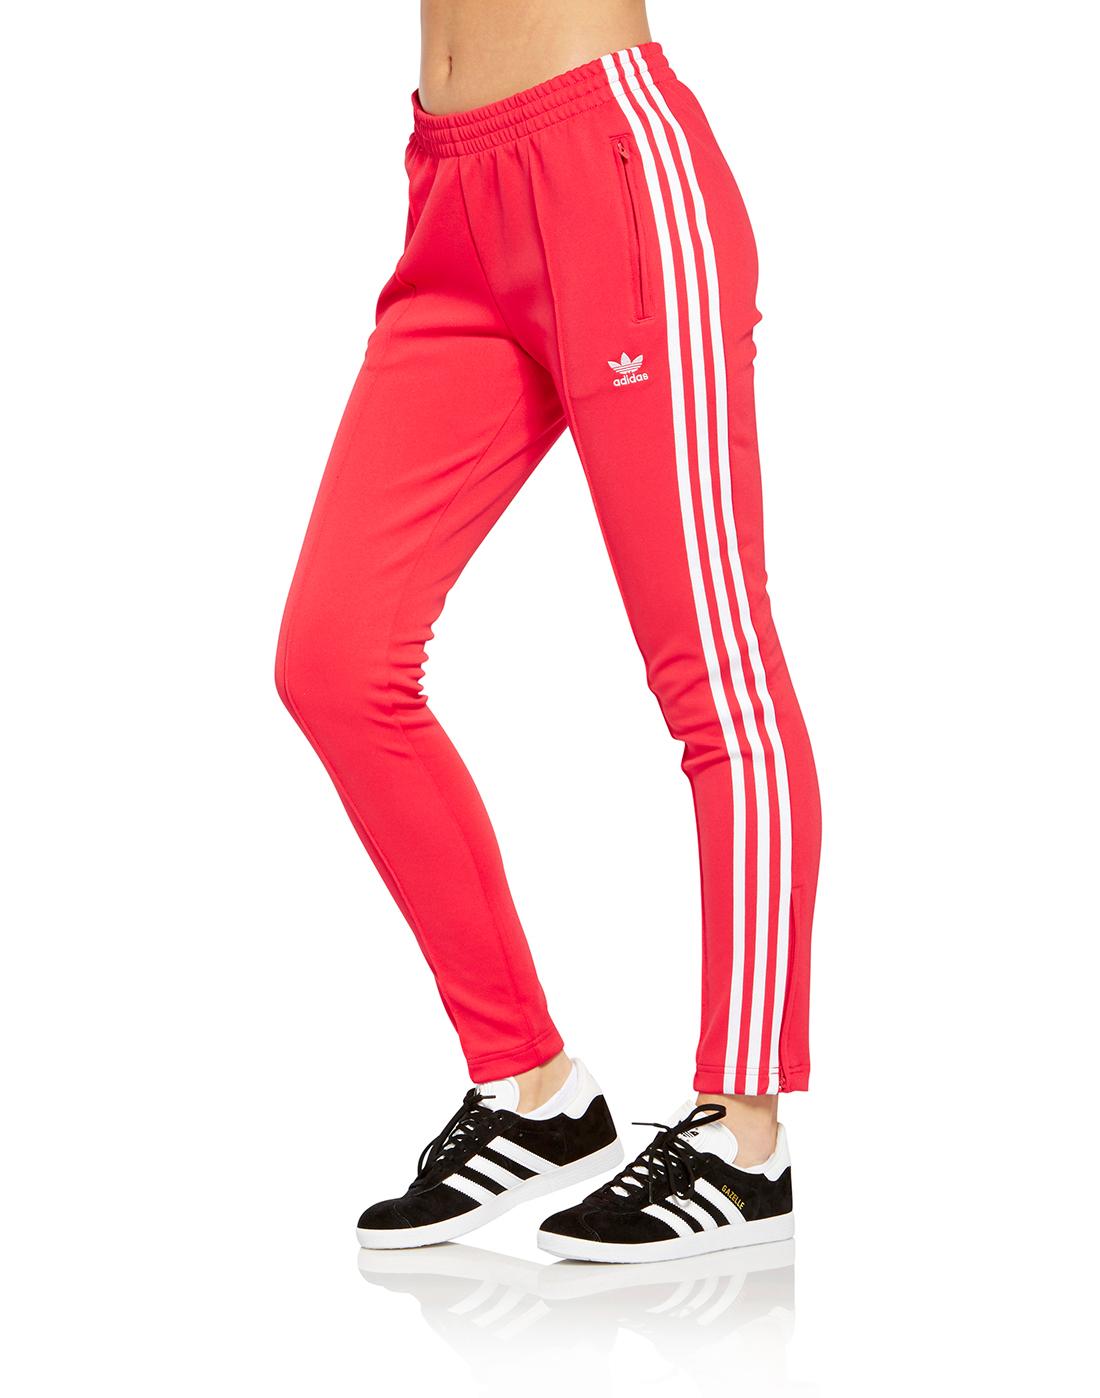 Women s Red adidas Originals Superstar Track pants  90c2d1d83c